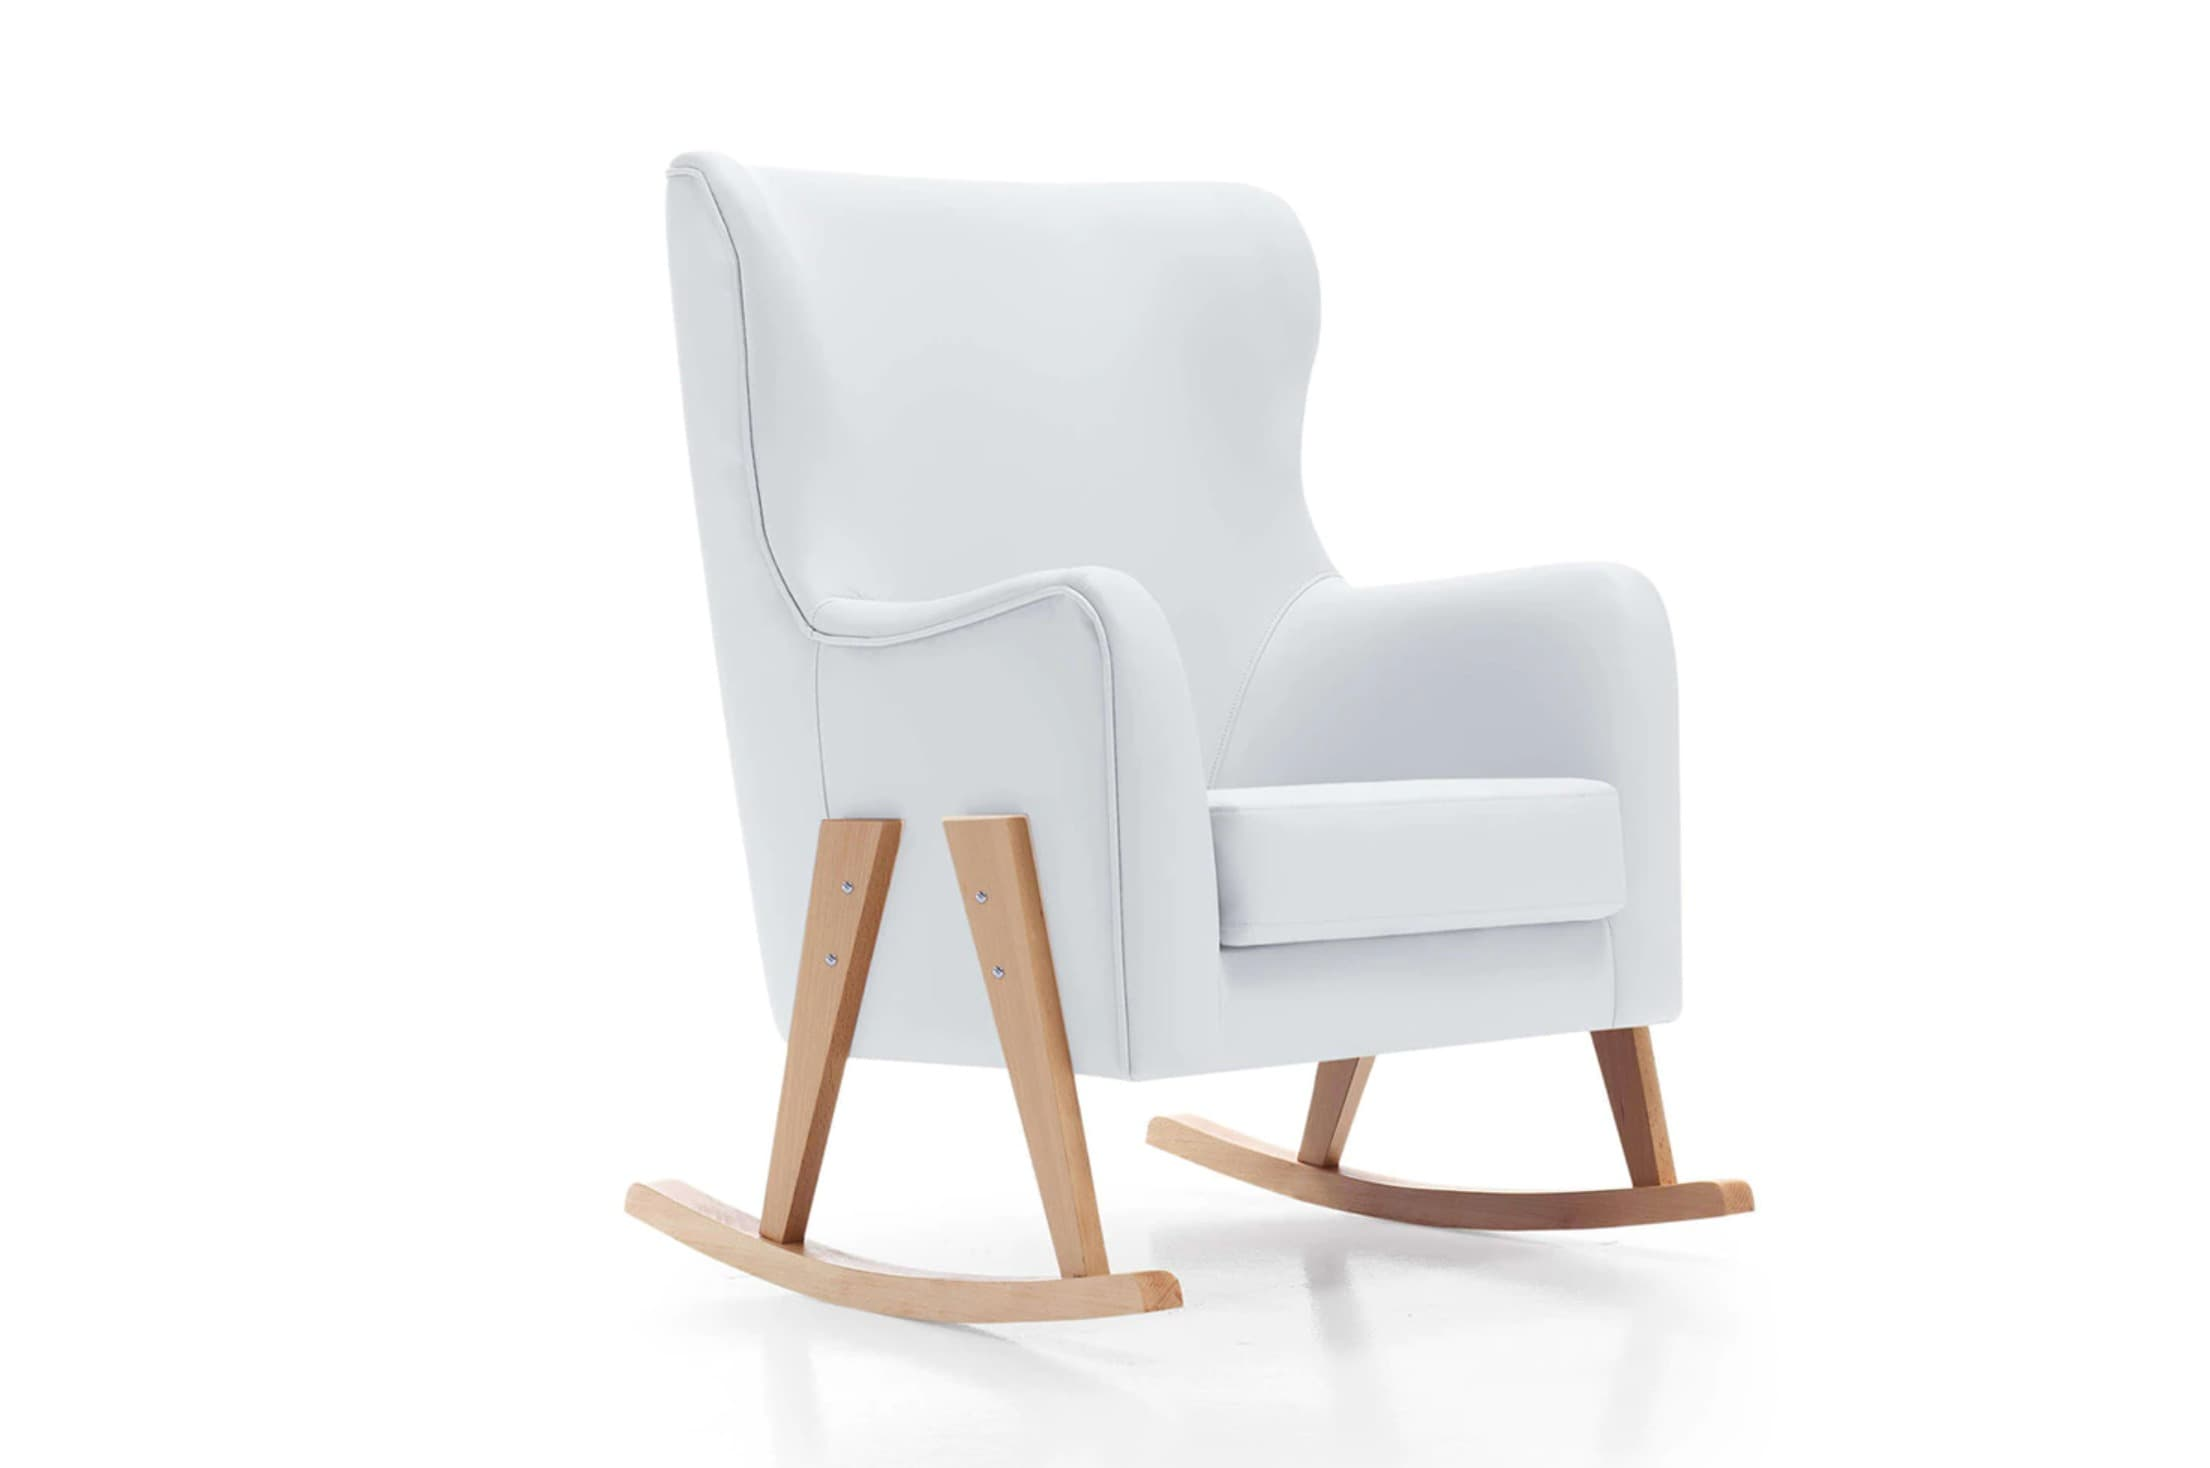 Butaca de Lactancia Alondra Glam Natural White con tapizado en polipiel y patas madera blanco/madera